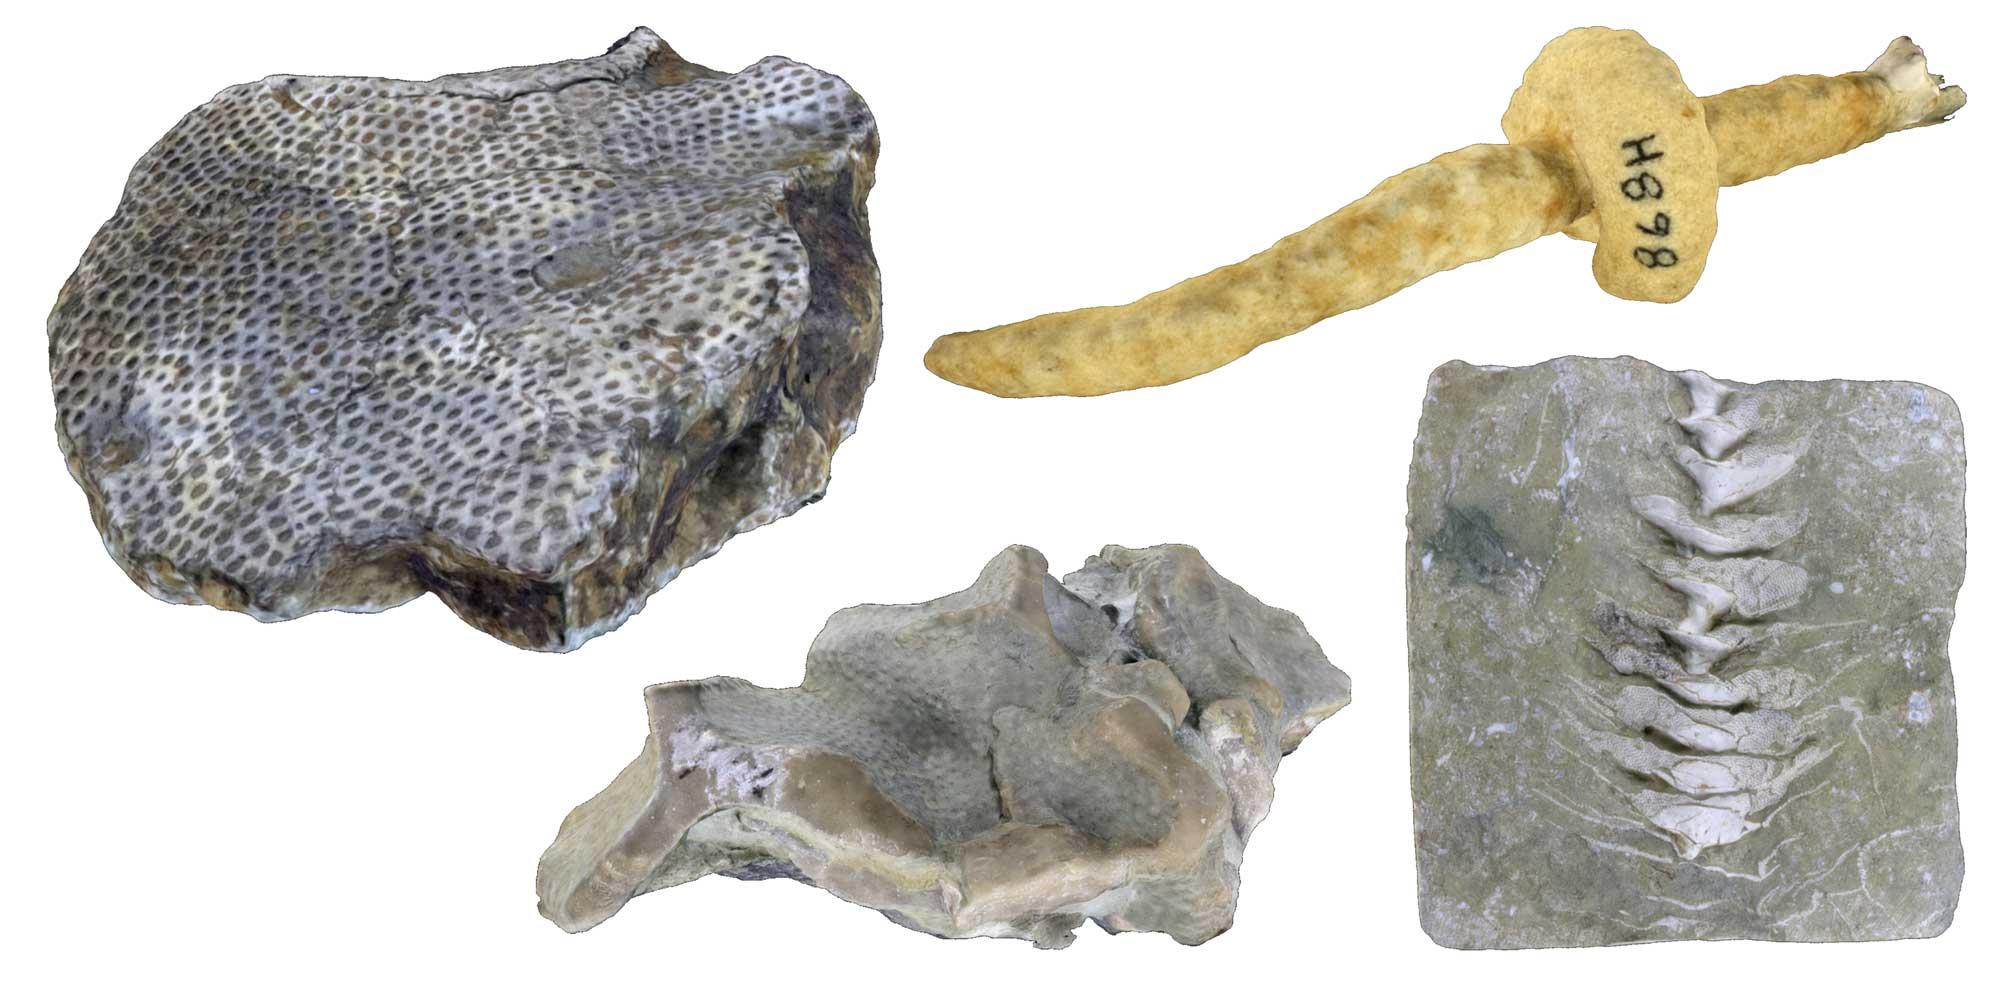 Images of bryozoans.